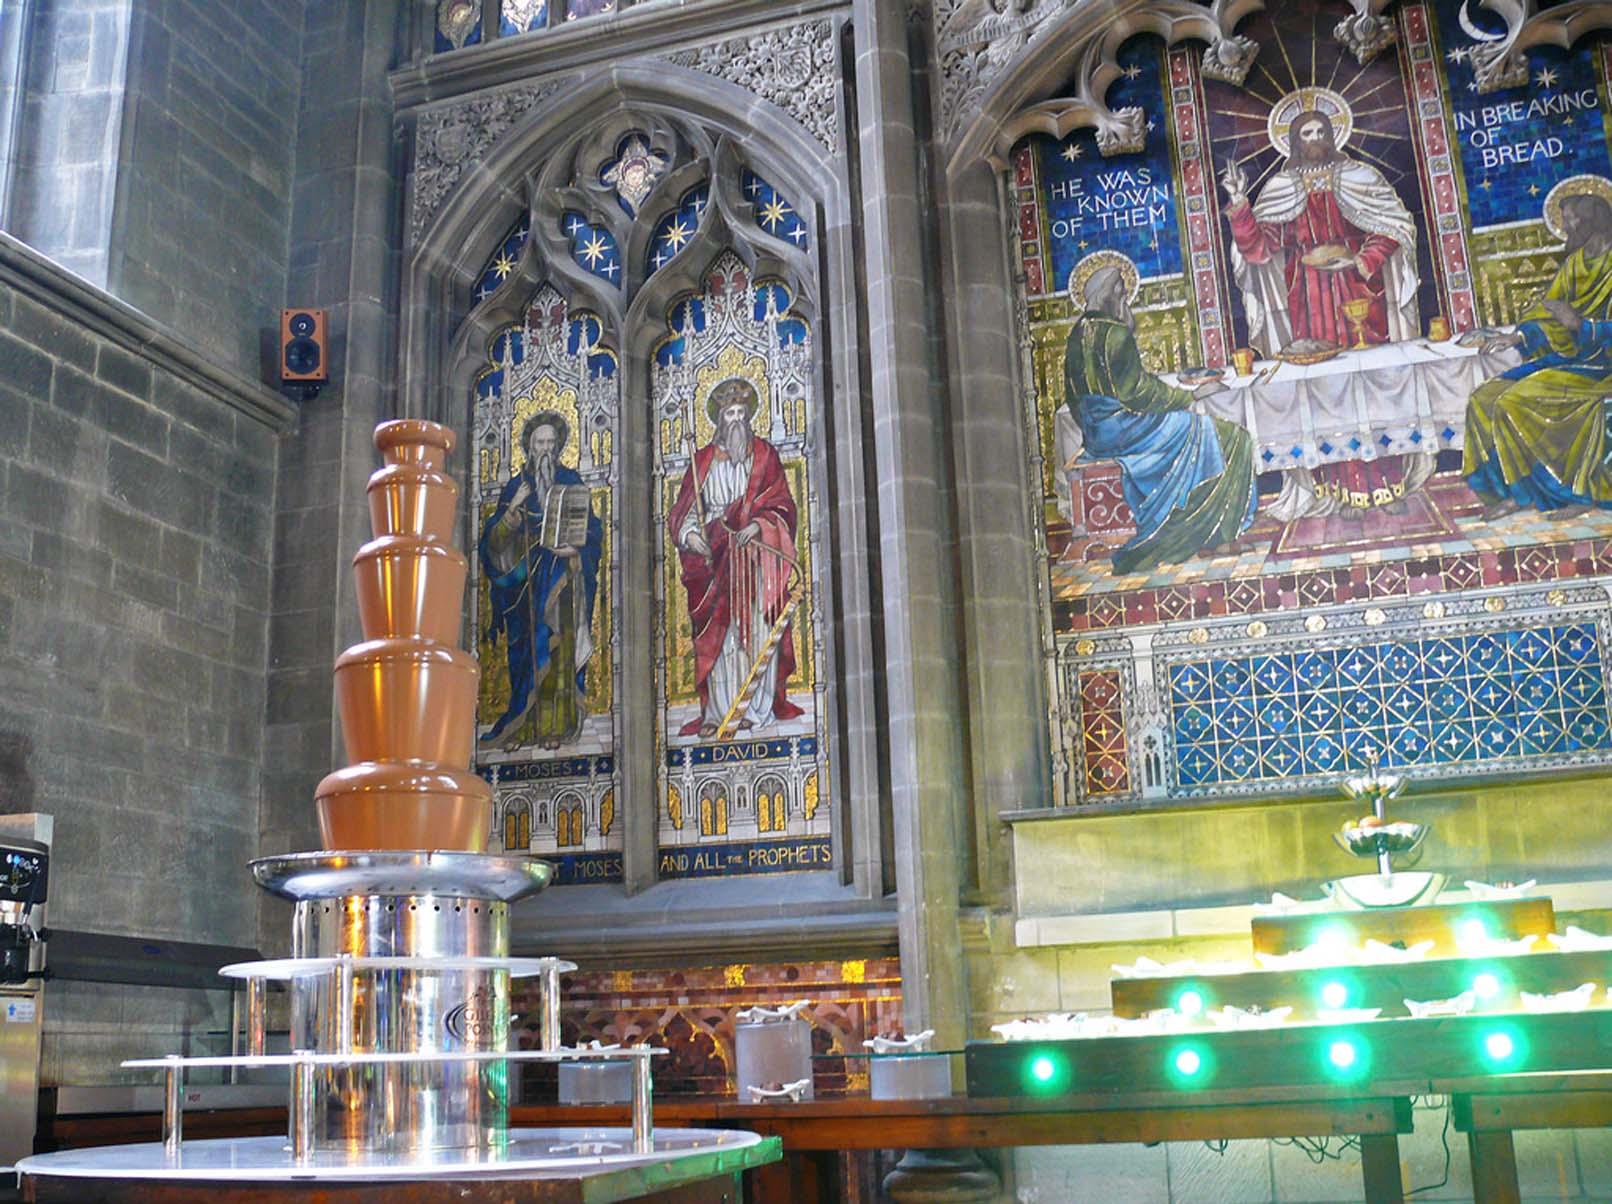 Chocolate Fountain in former church, Derby. The Caravan Gallery